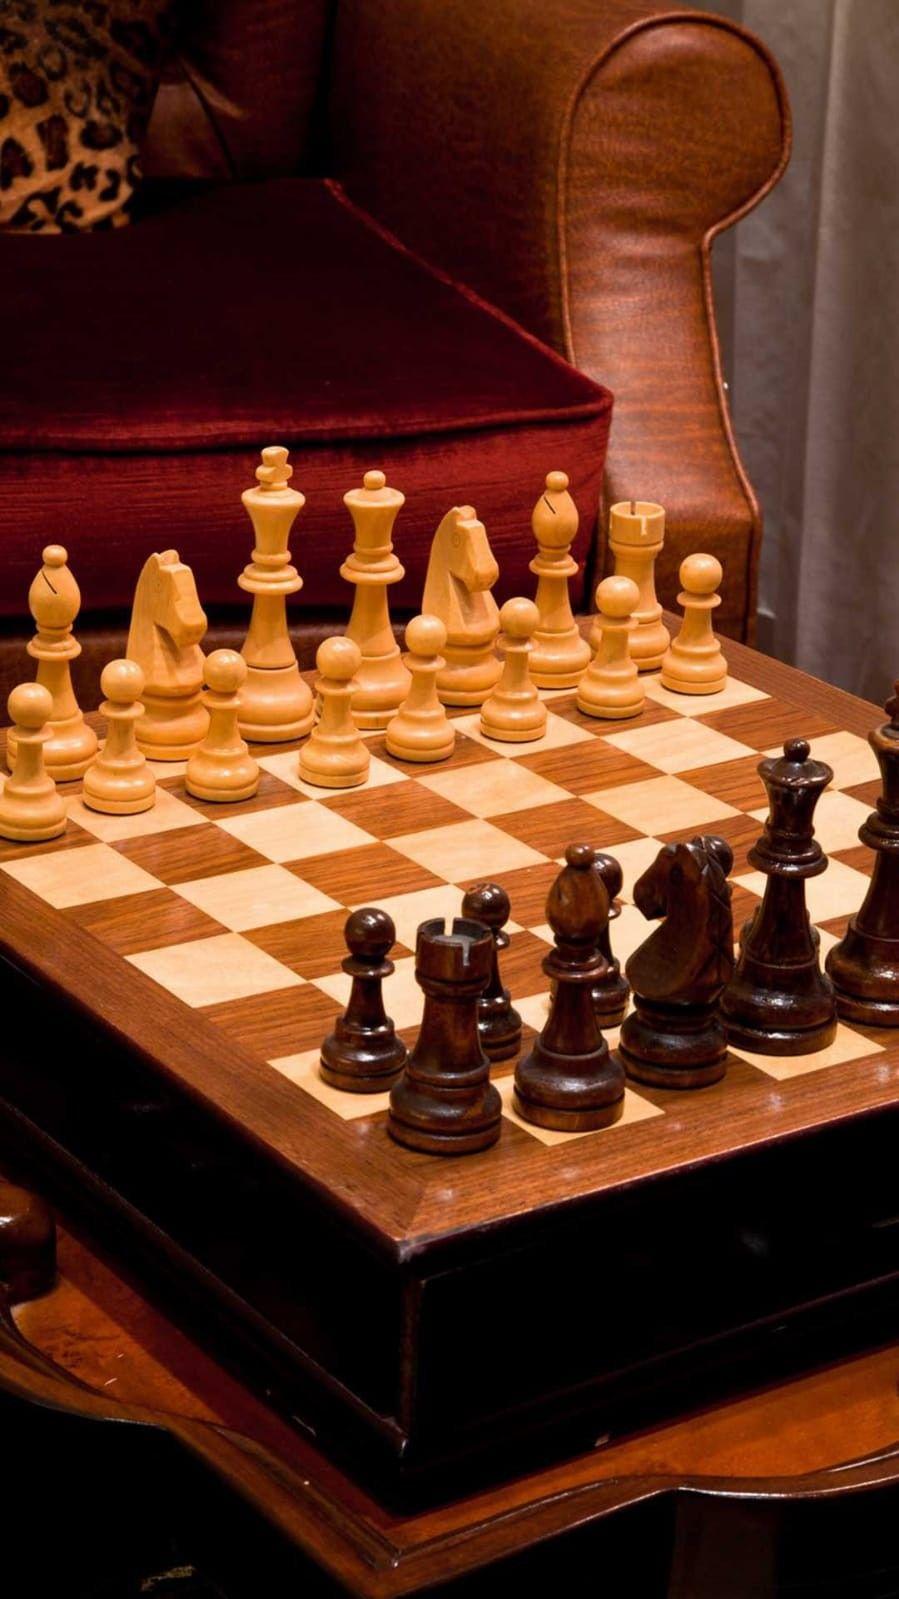 Pin De Walter Raymundo De Amorim Em Xadrez Xadrez Jogo Xadrez Chess Pecas De Xadrez